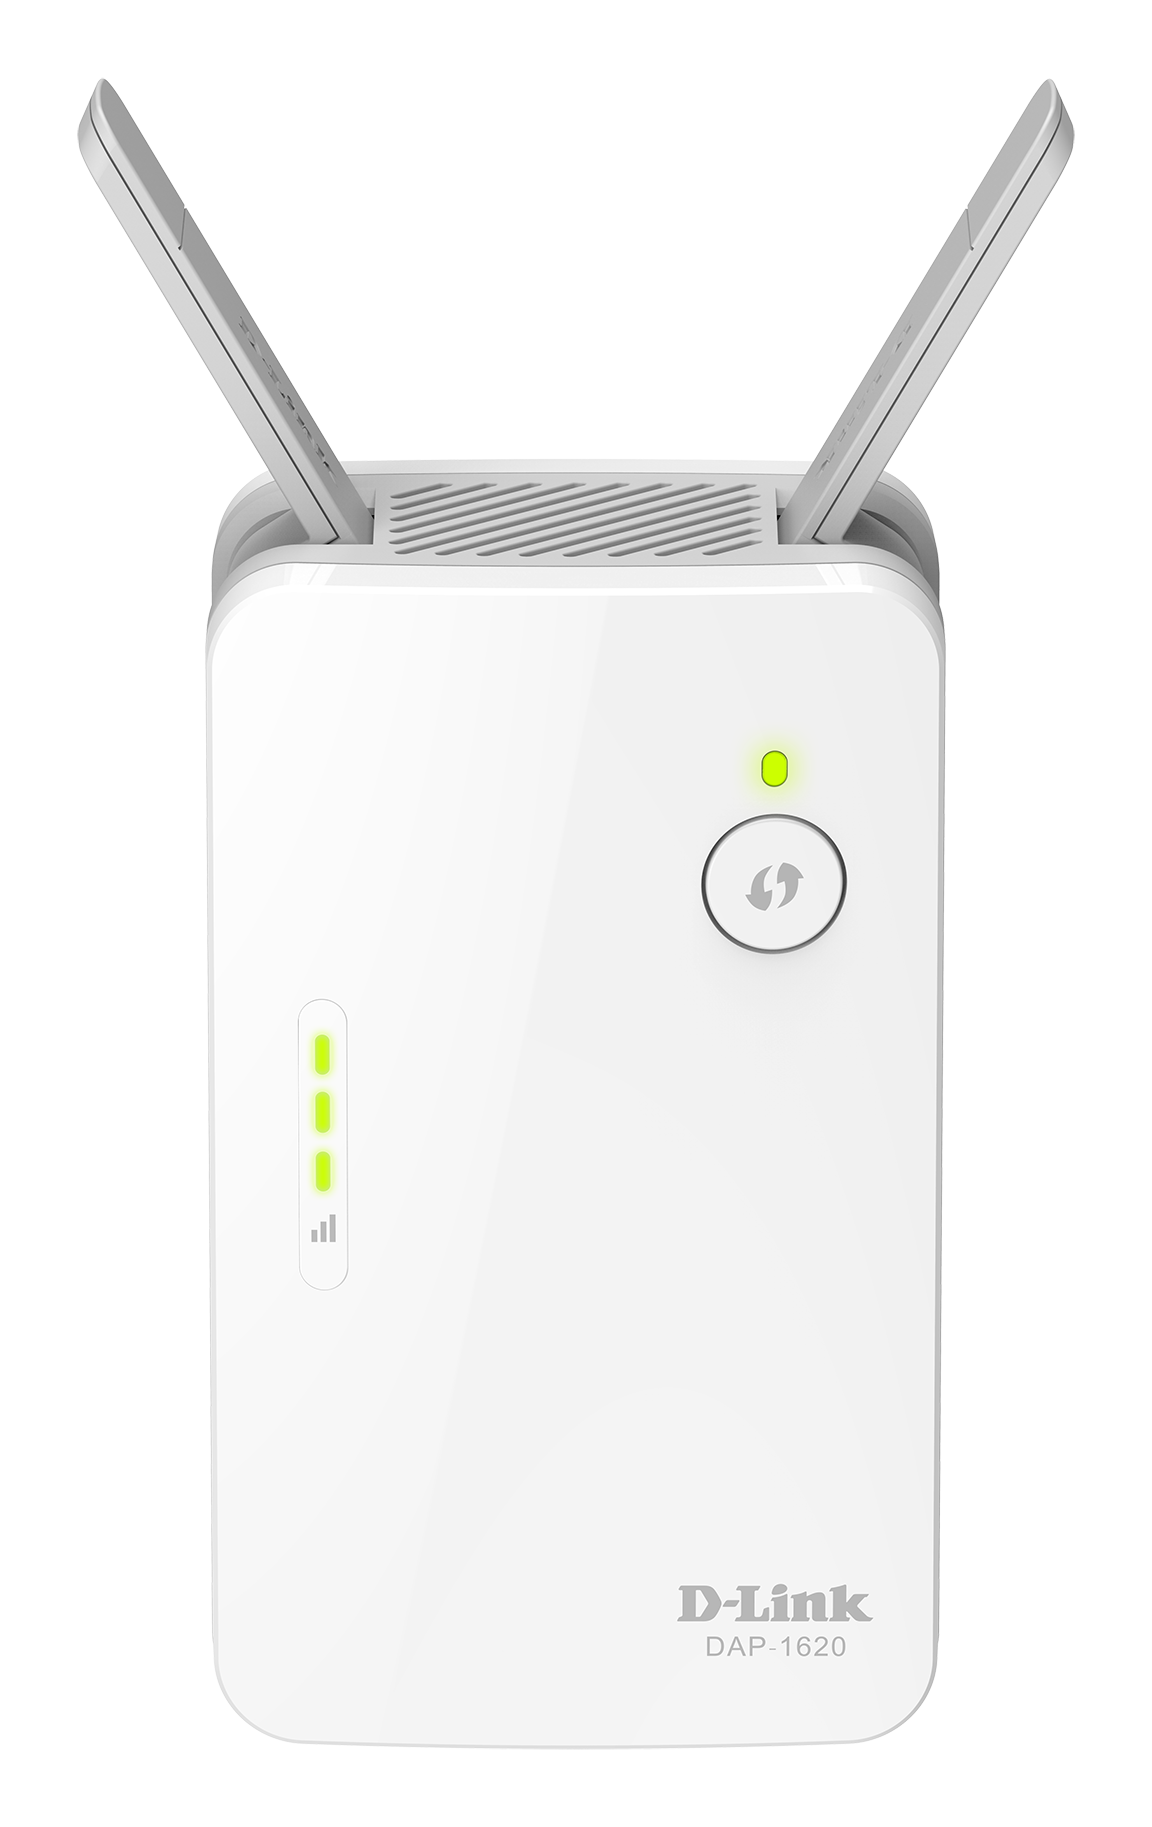 D-Link DAP-1620 Wireless Dual-band Wi-Fi AC1200 Range Extender Antenna Repeater